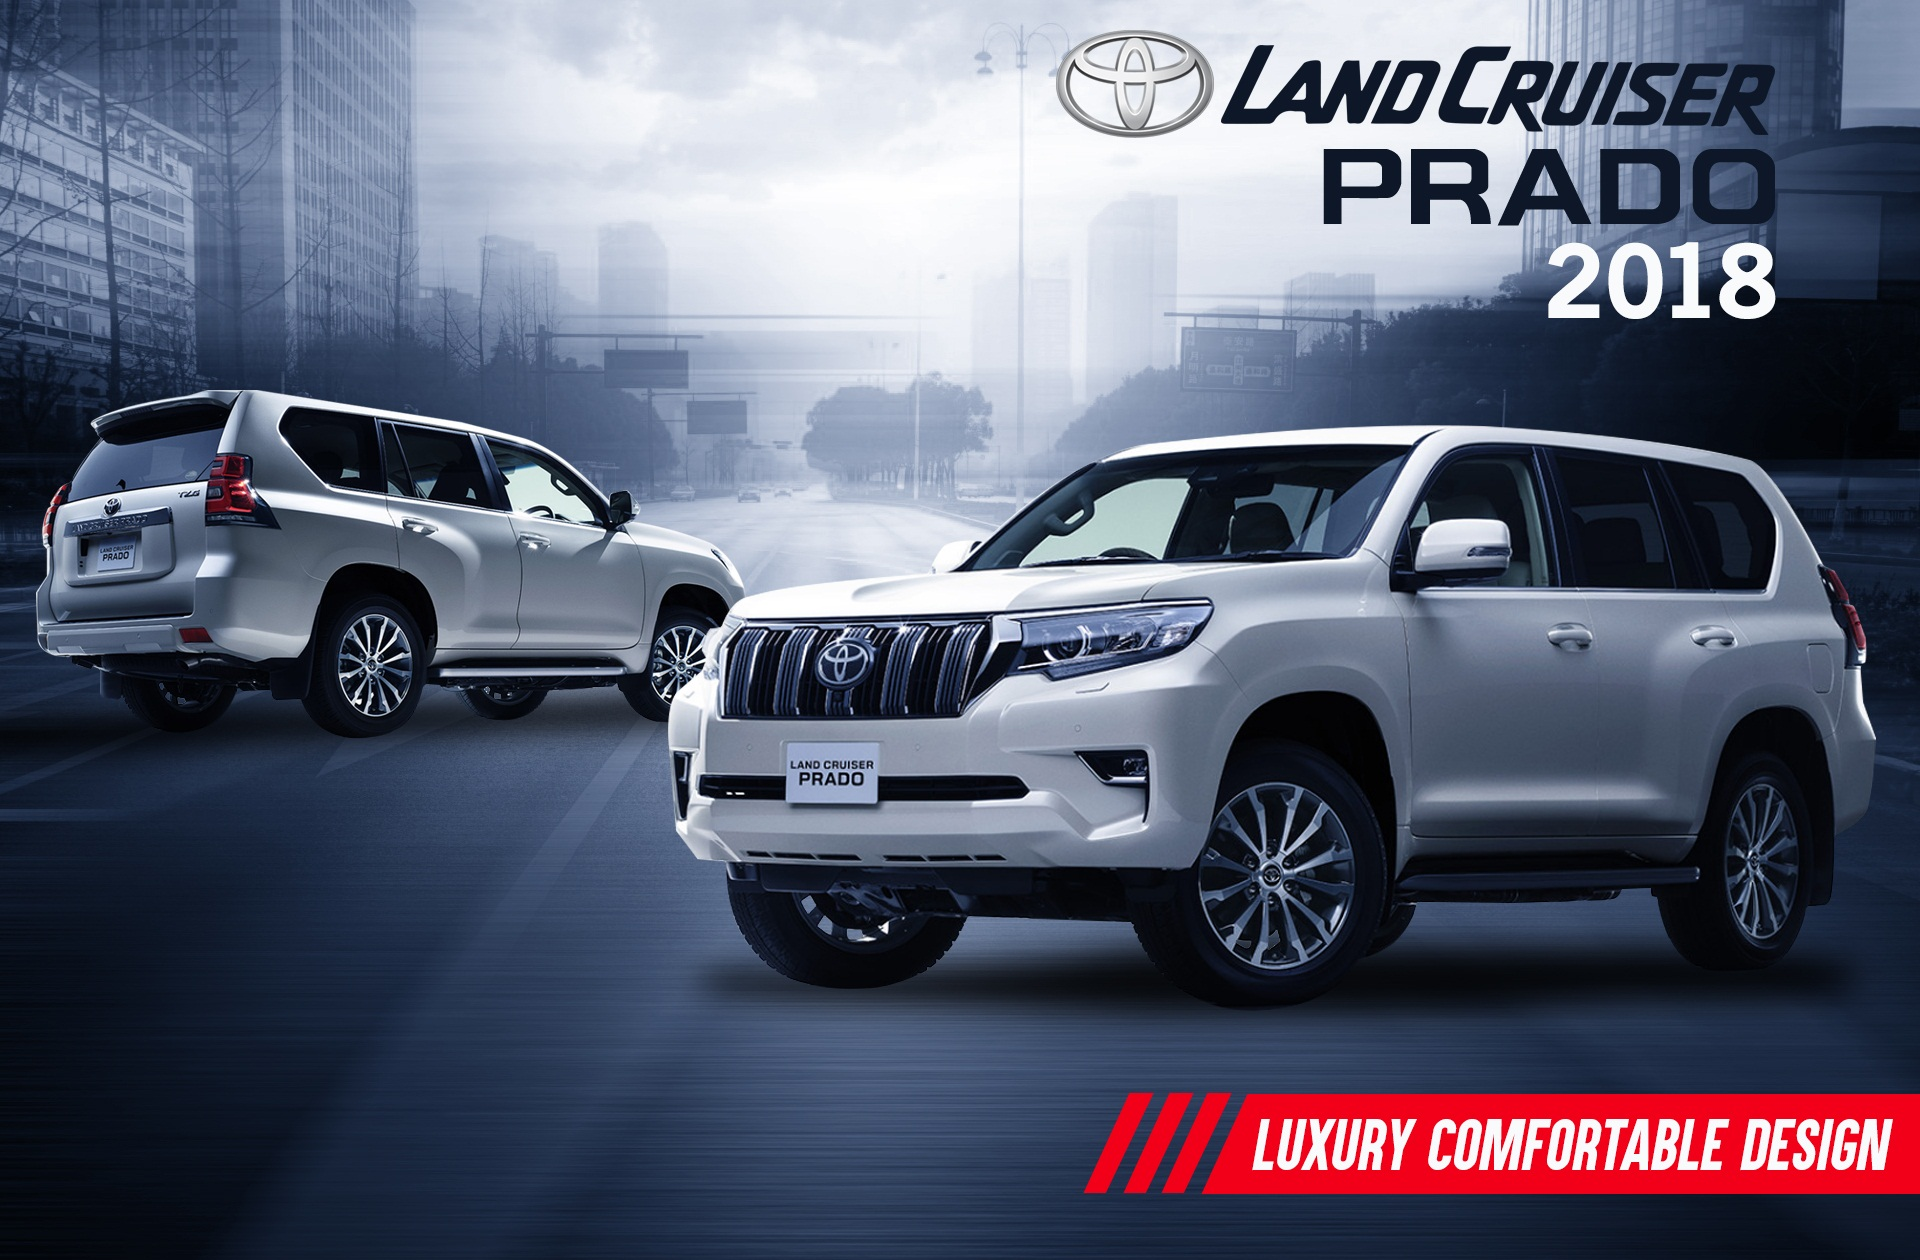 Brand New Land Cruiser Prado